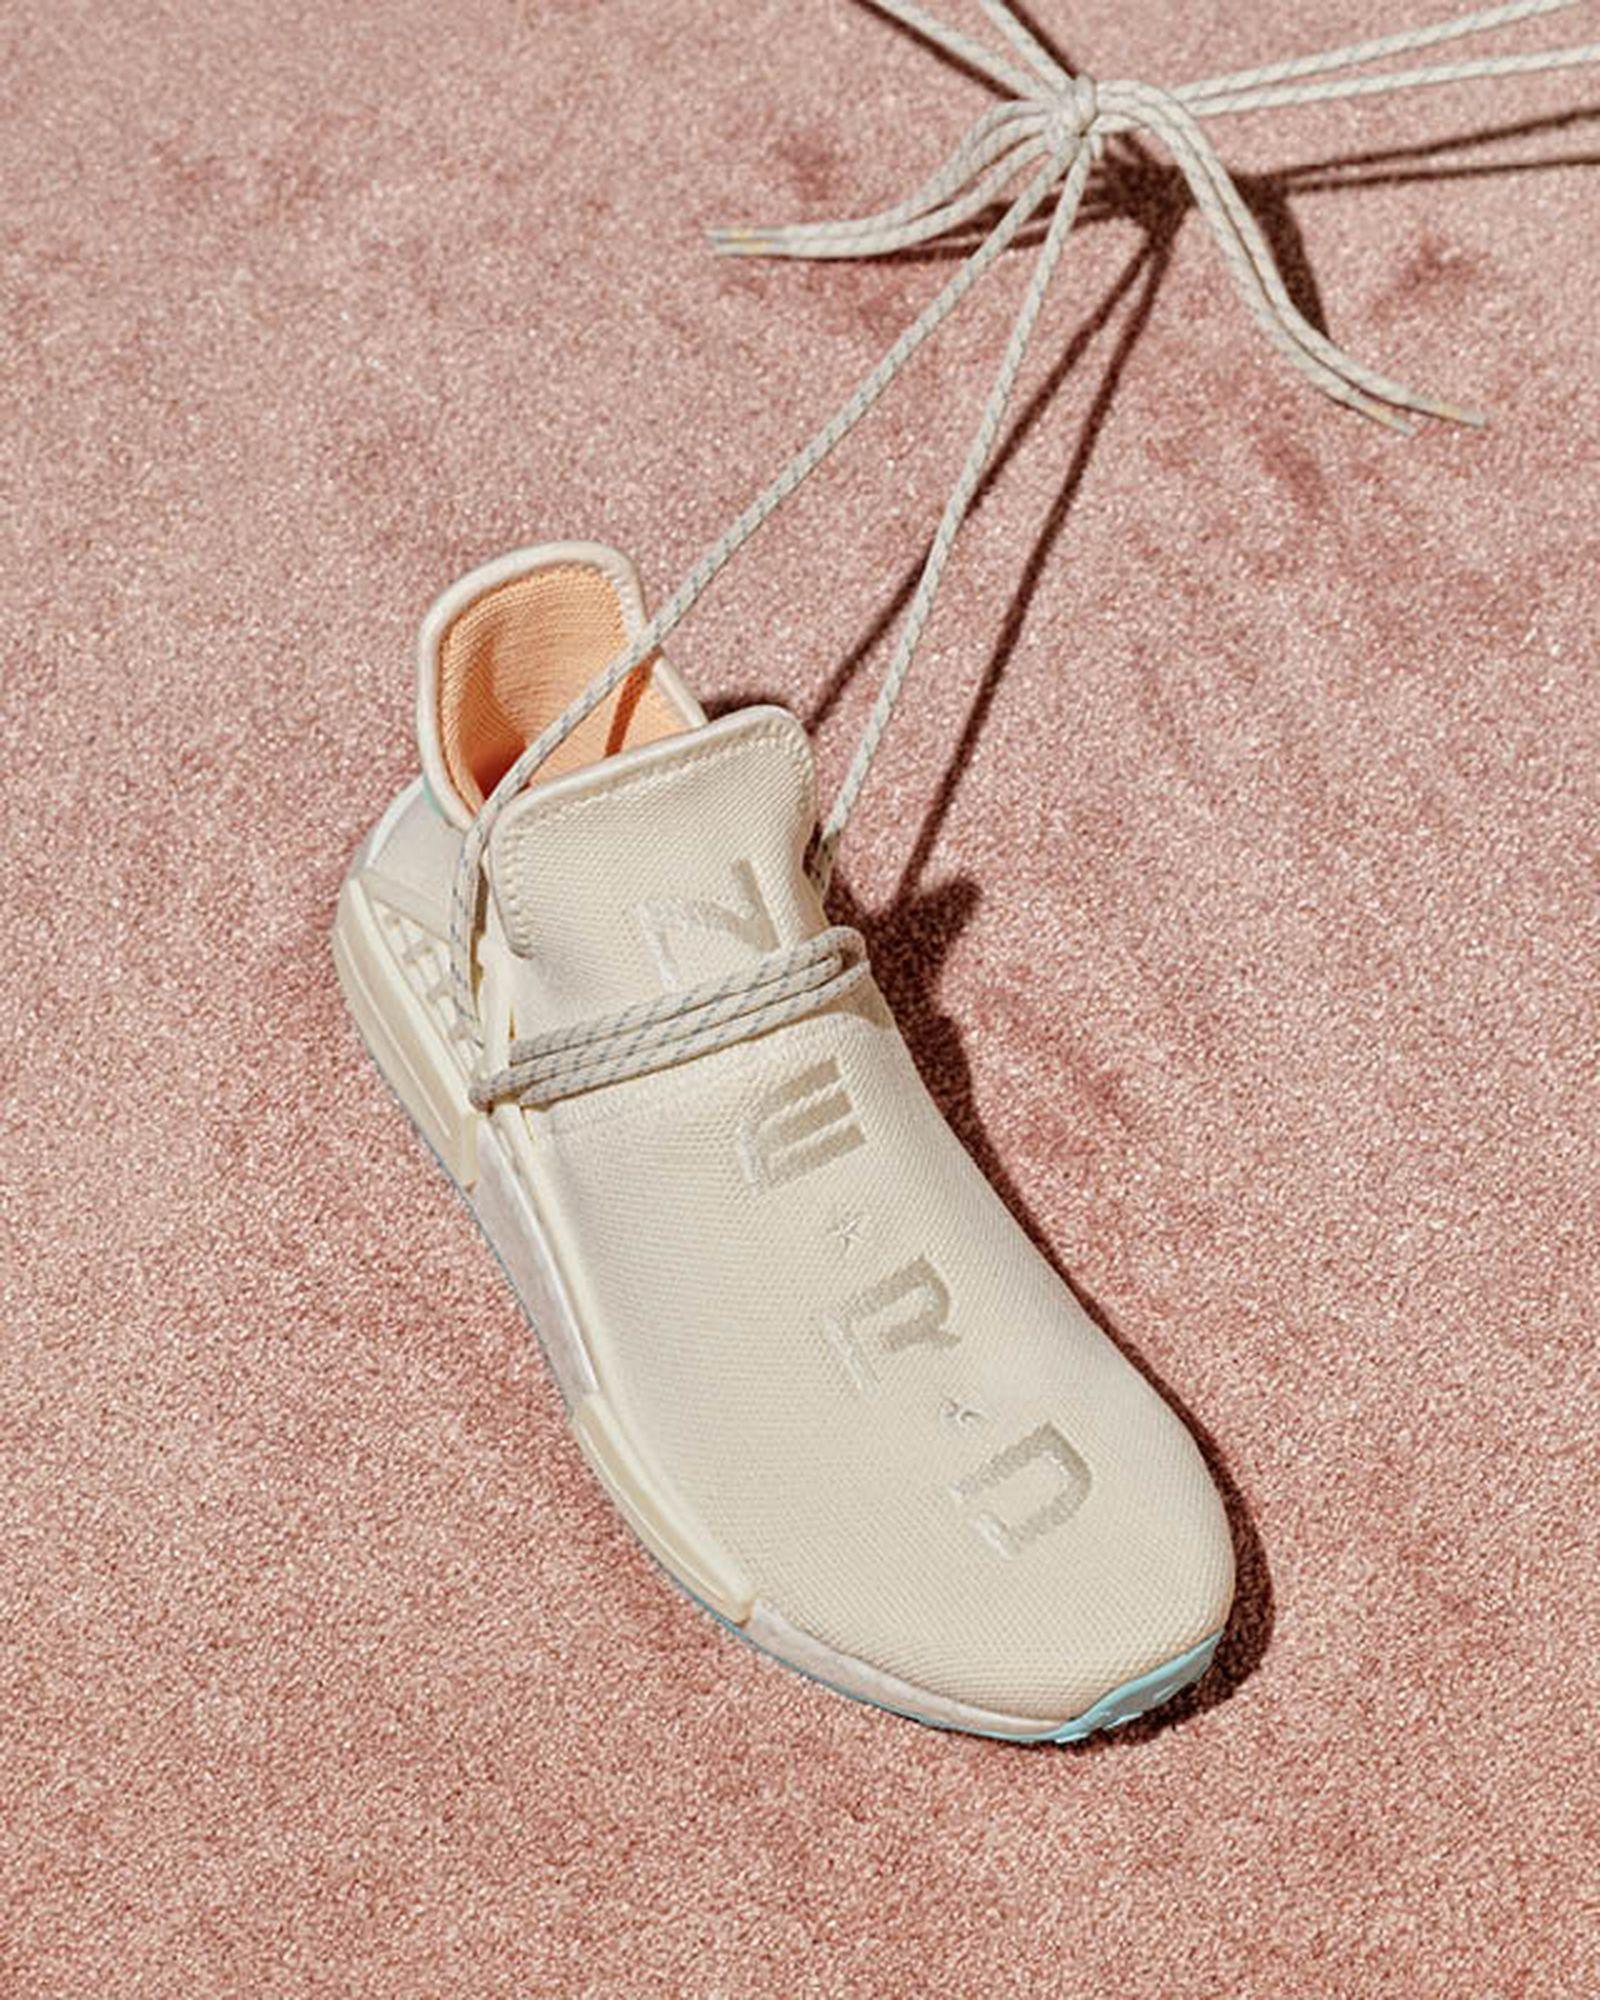 nerd-adidas-nmd-hu-release-date-price-05